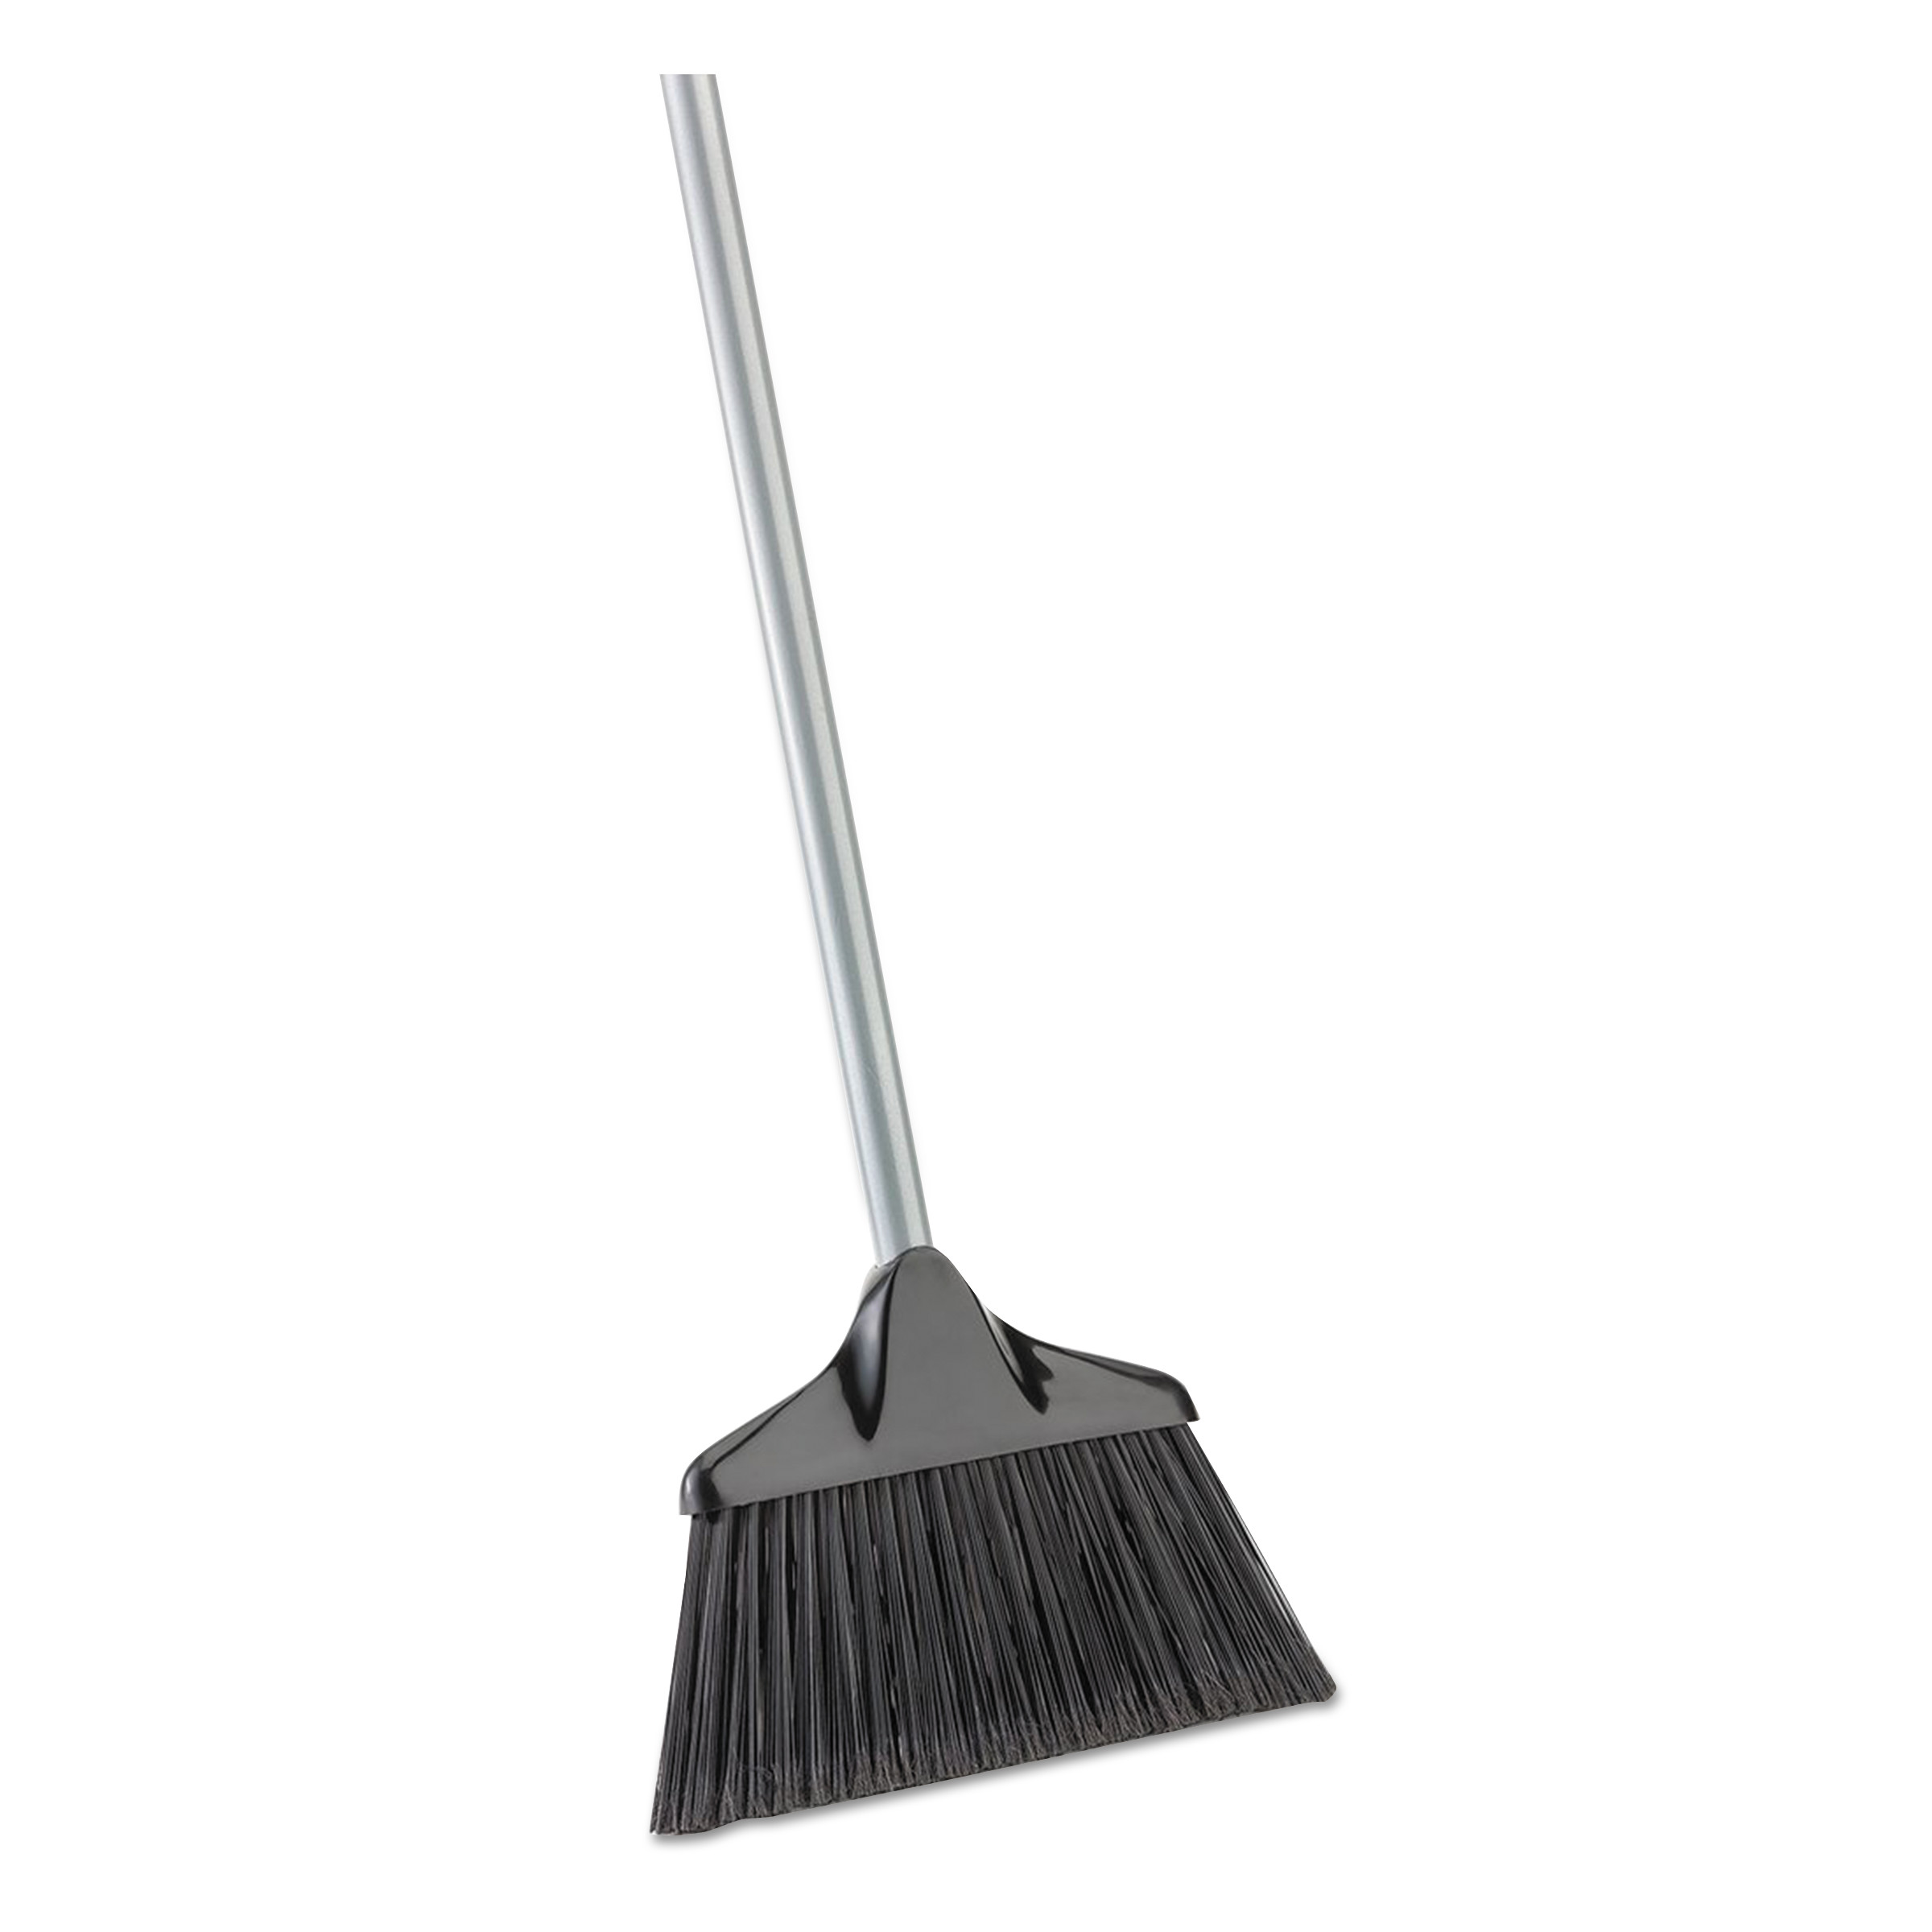 "Housekeeper Broom, 54"" Overall Length, Steel Handle, Black/Gray, 6/CT"